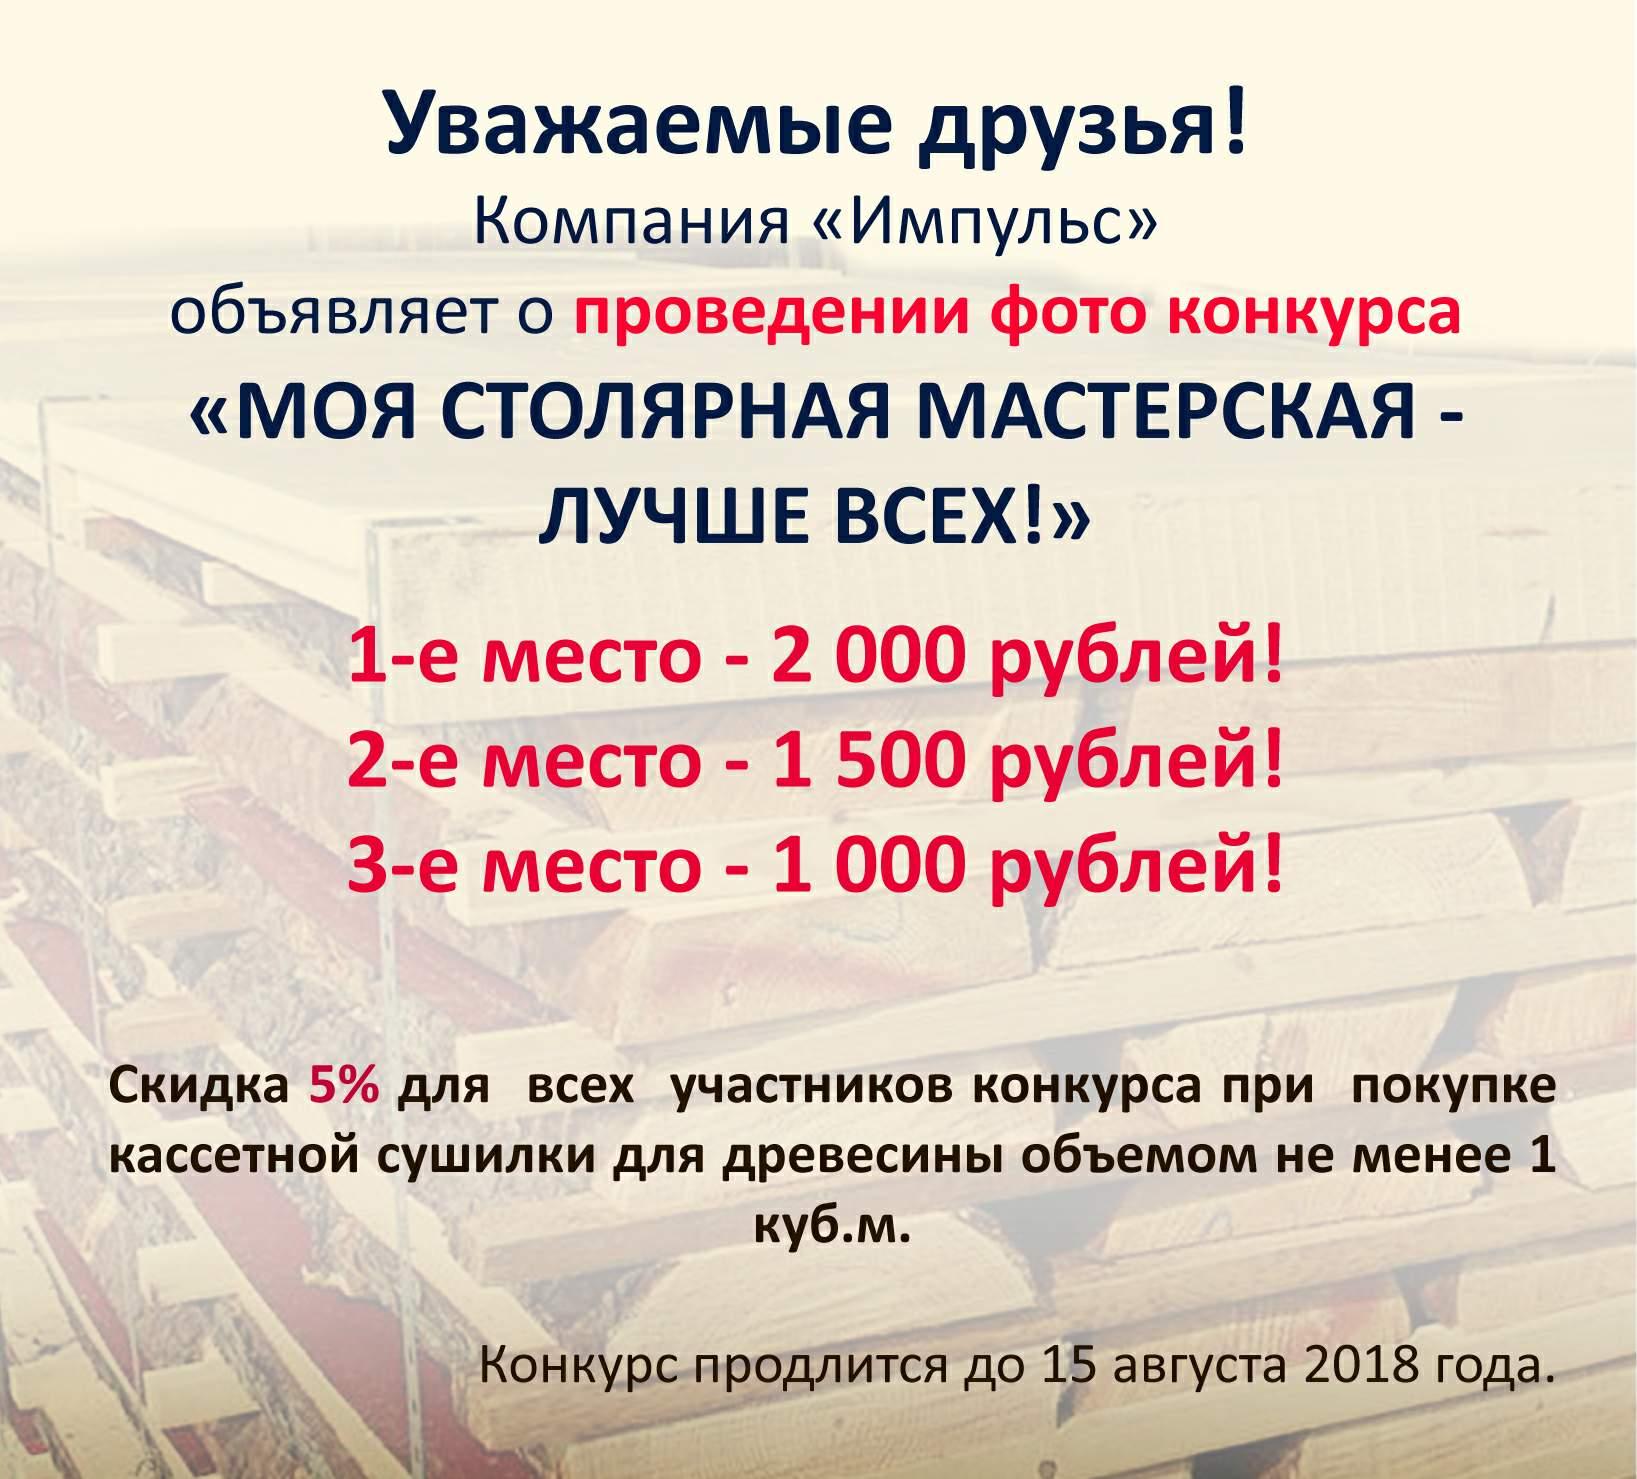 https://pp.userapi.com/c845017/v845017108/945d2/_u32q0vor-s.jpg